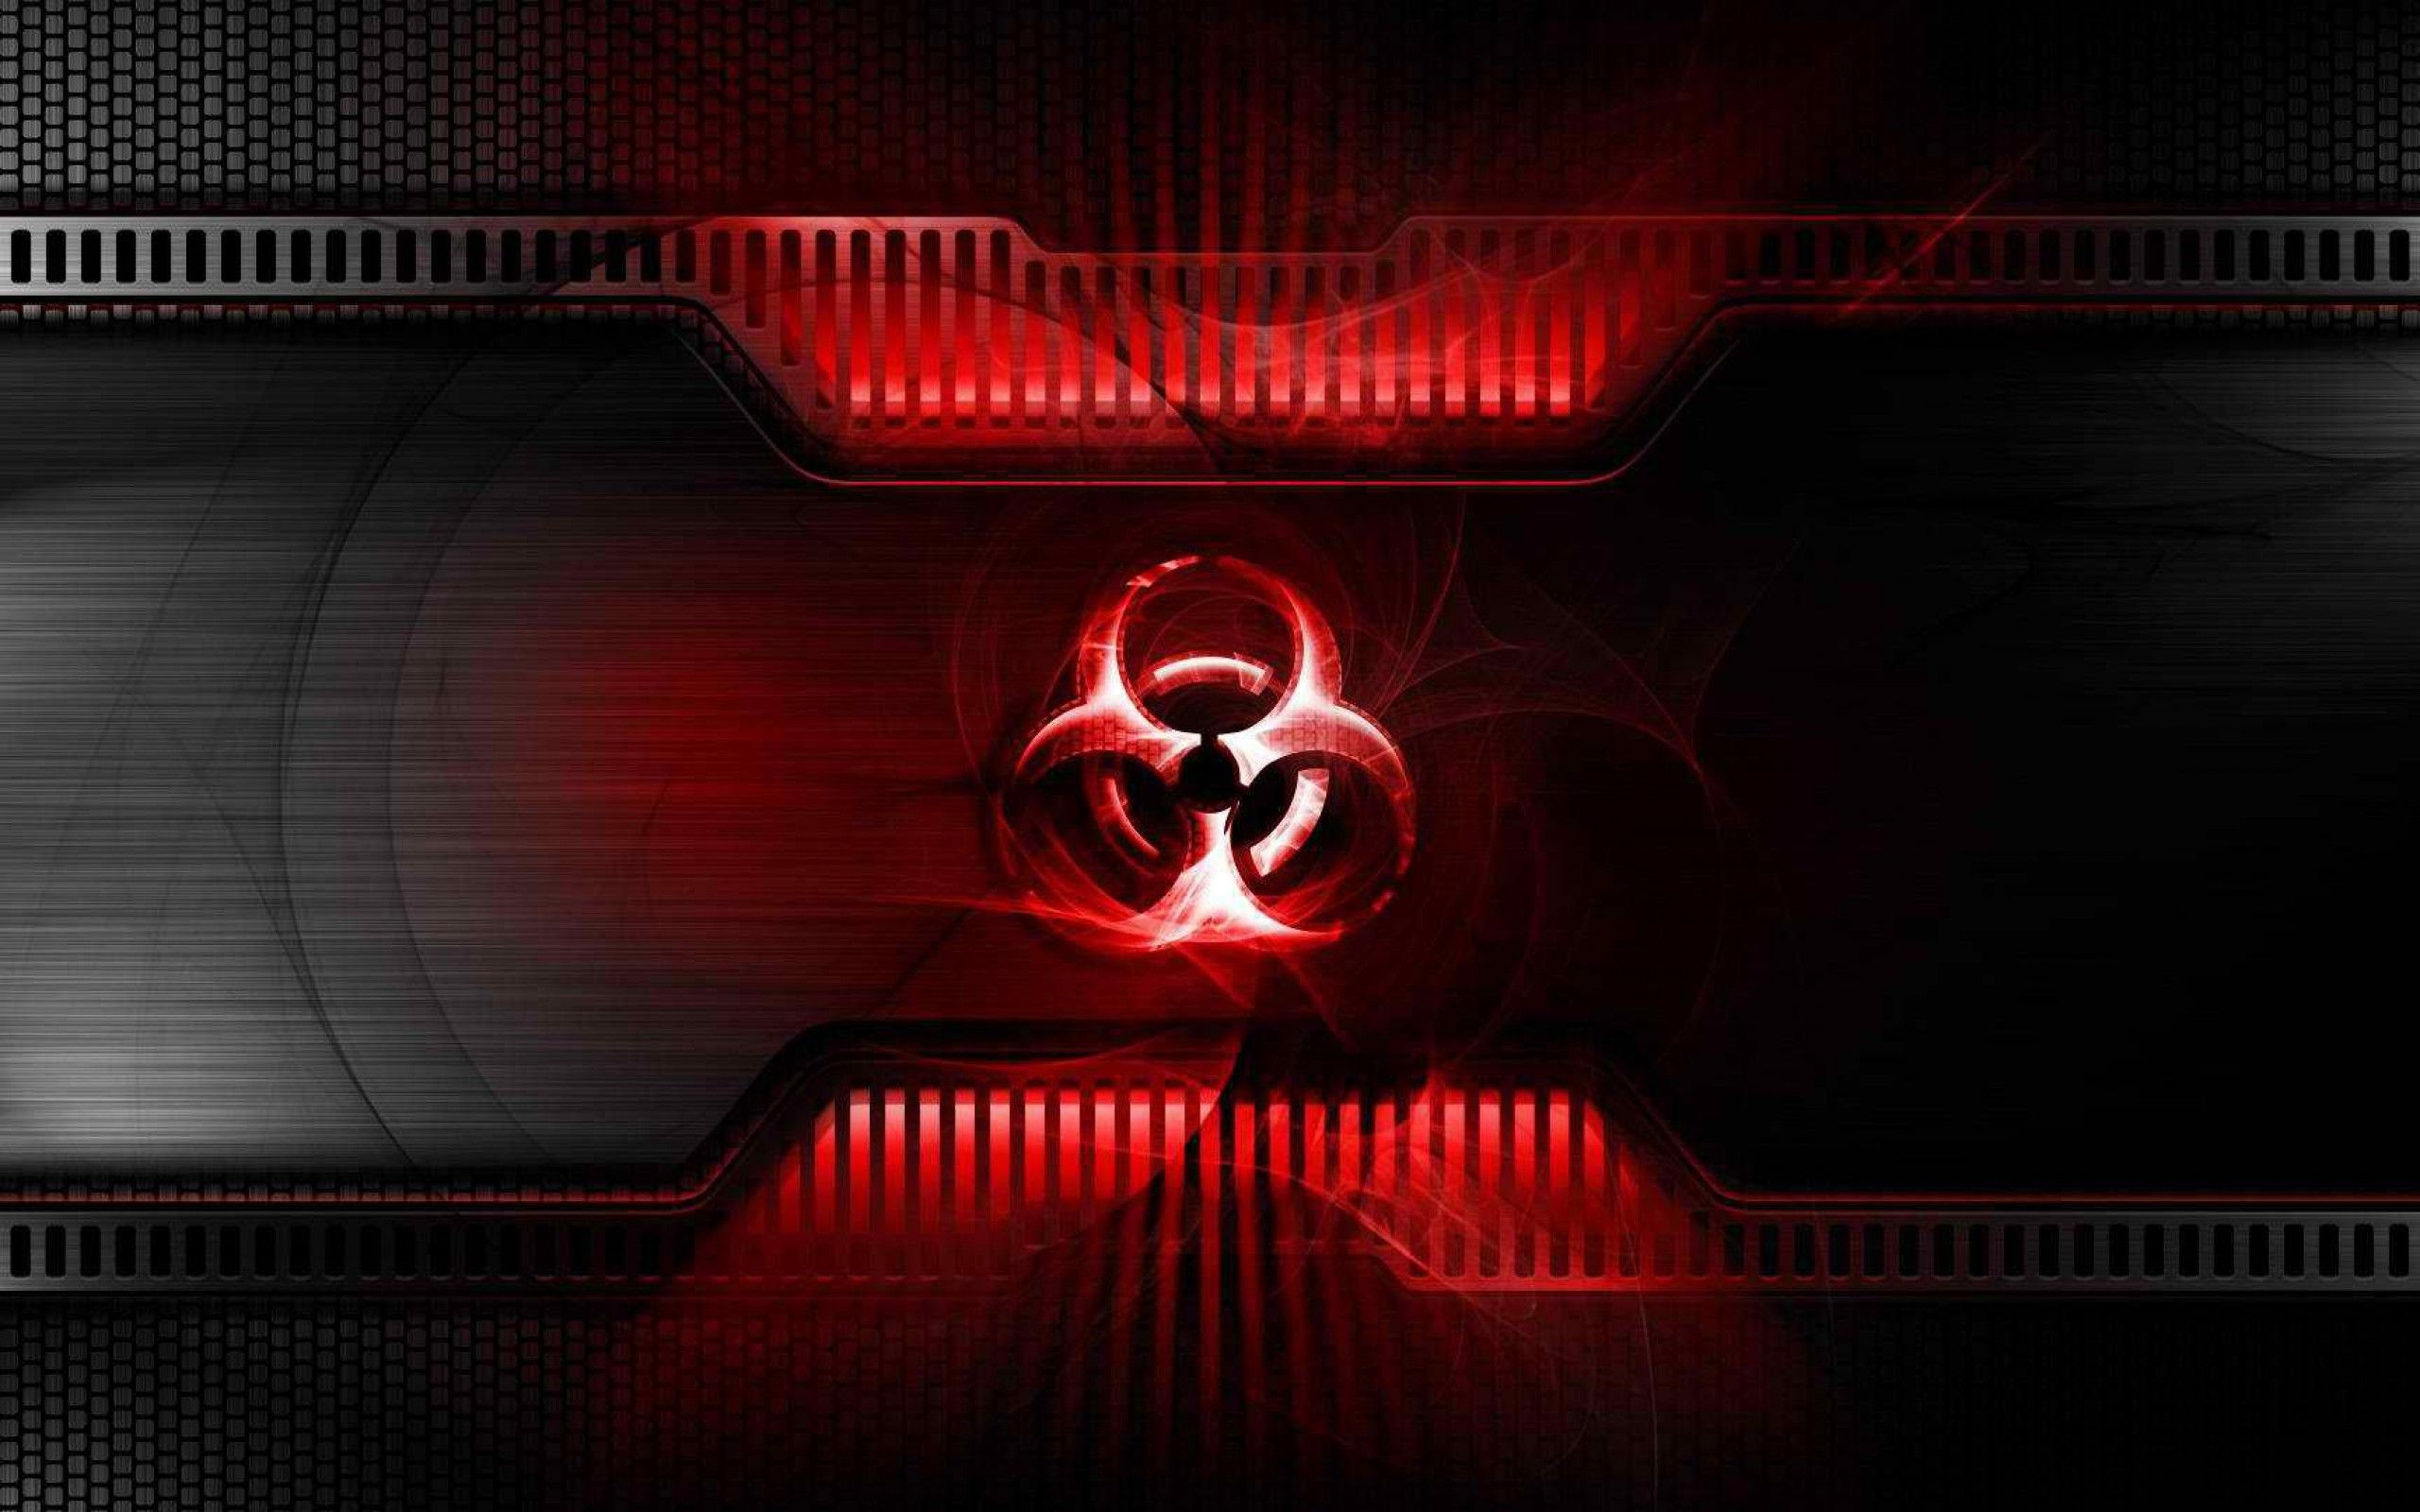 wallpaper.wiki-Biohazard-Symbol-Desktop-Wallpaper-PIC-WPB0014942